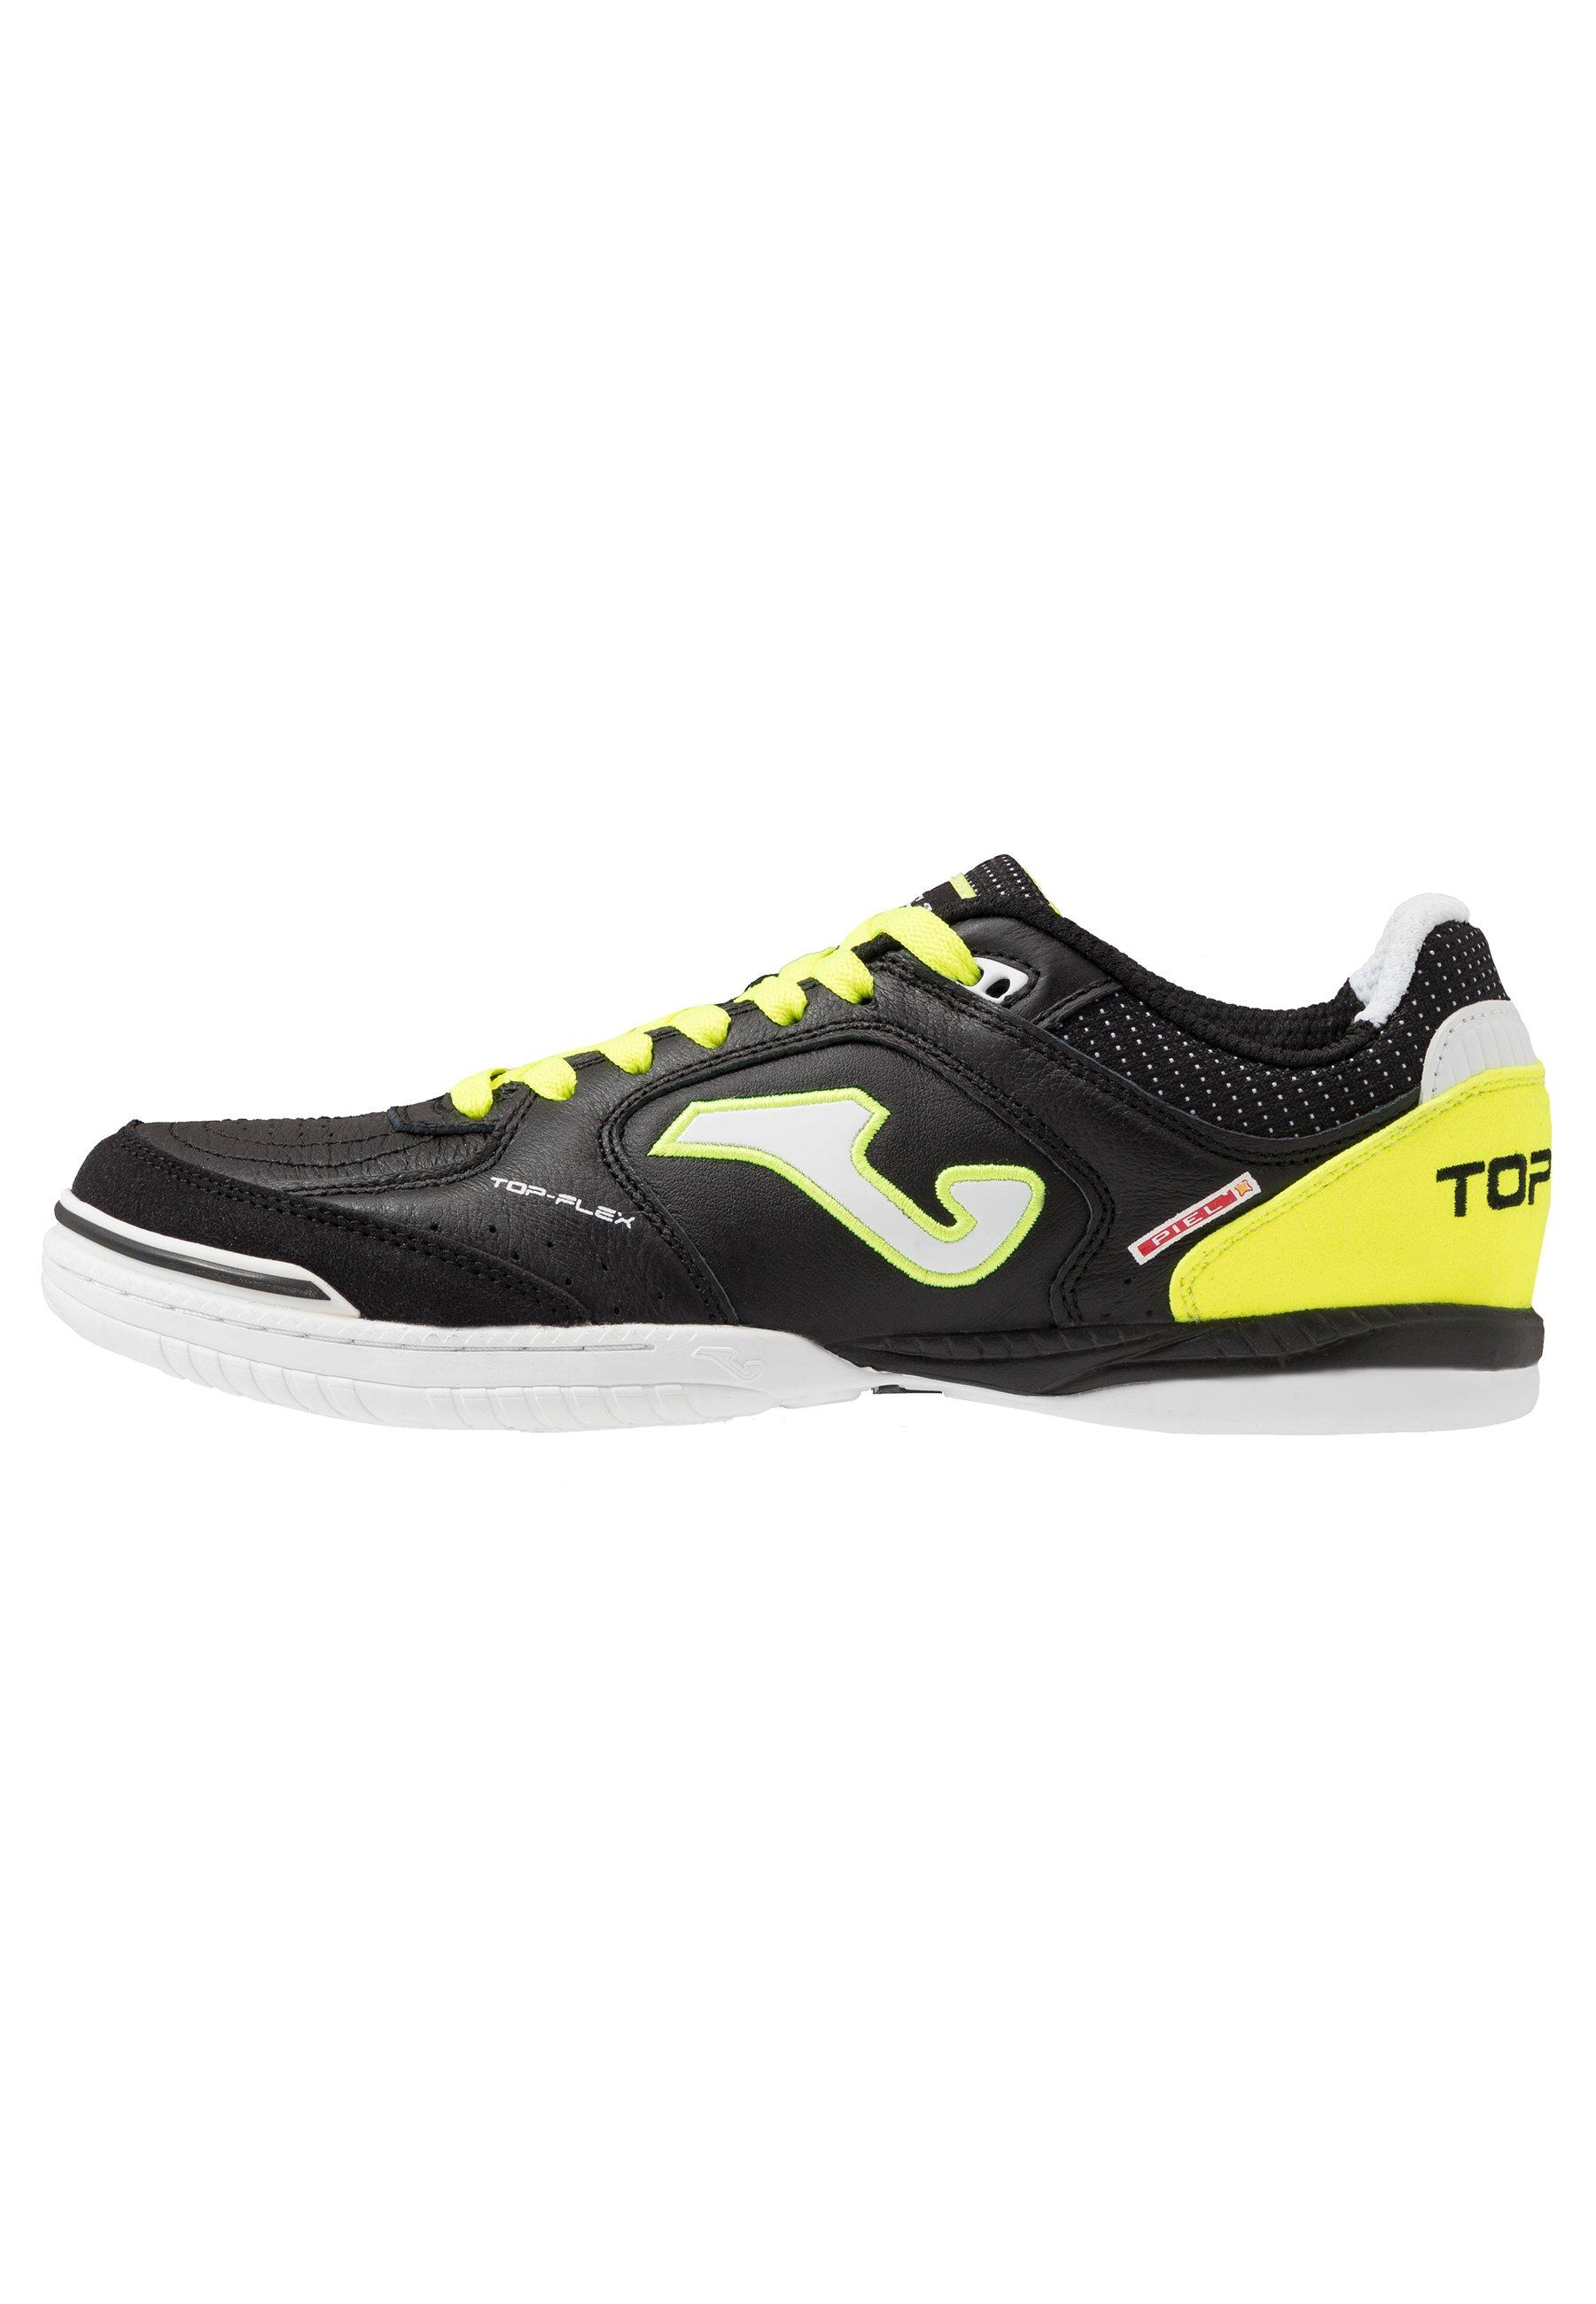 Joma Top Flex - Indoor Football Boots Black/yellow